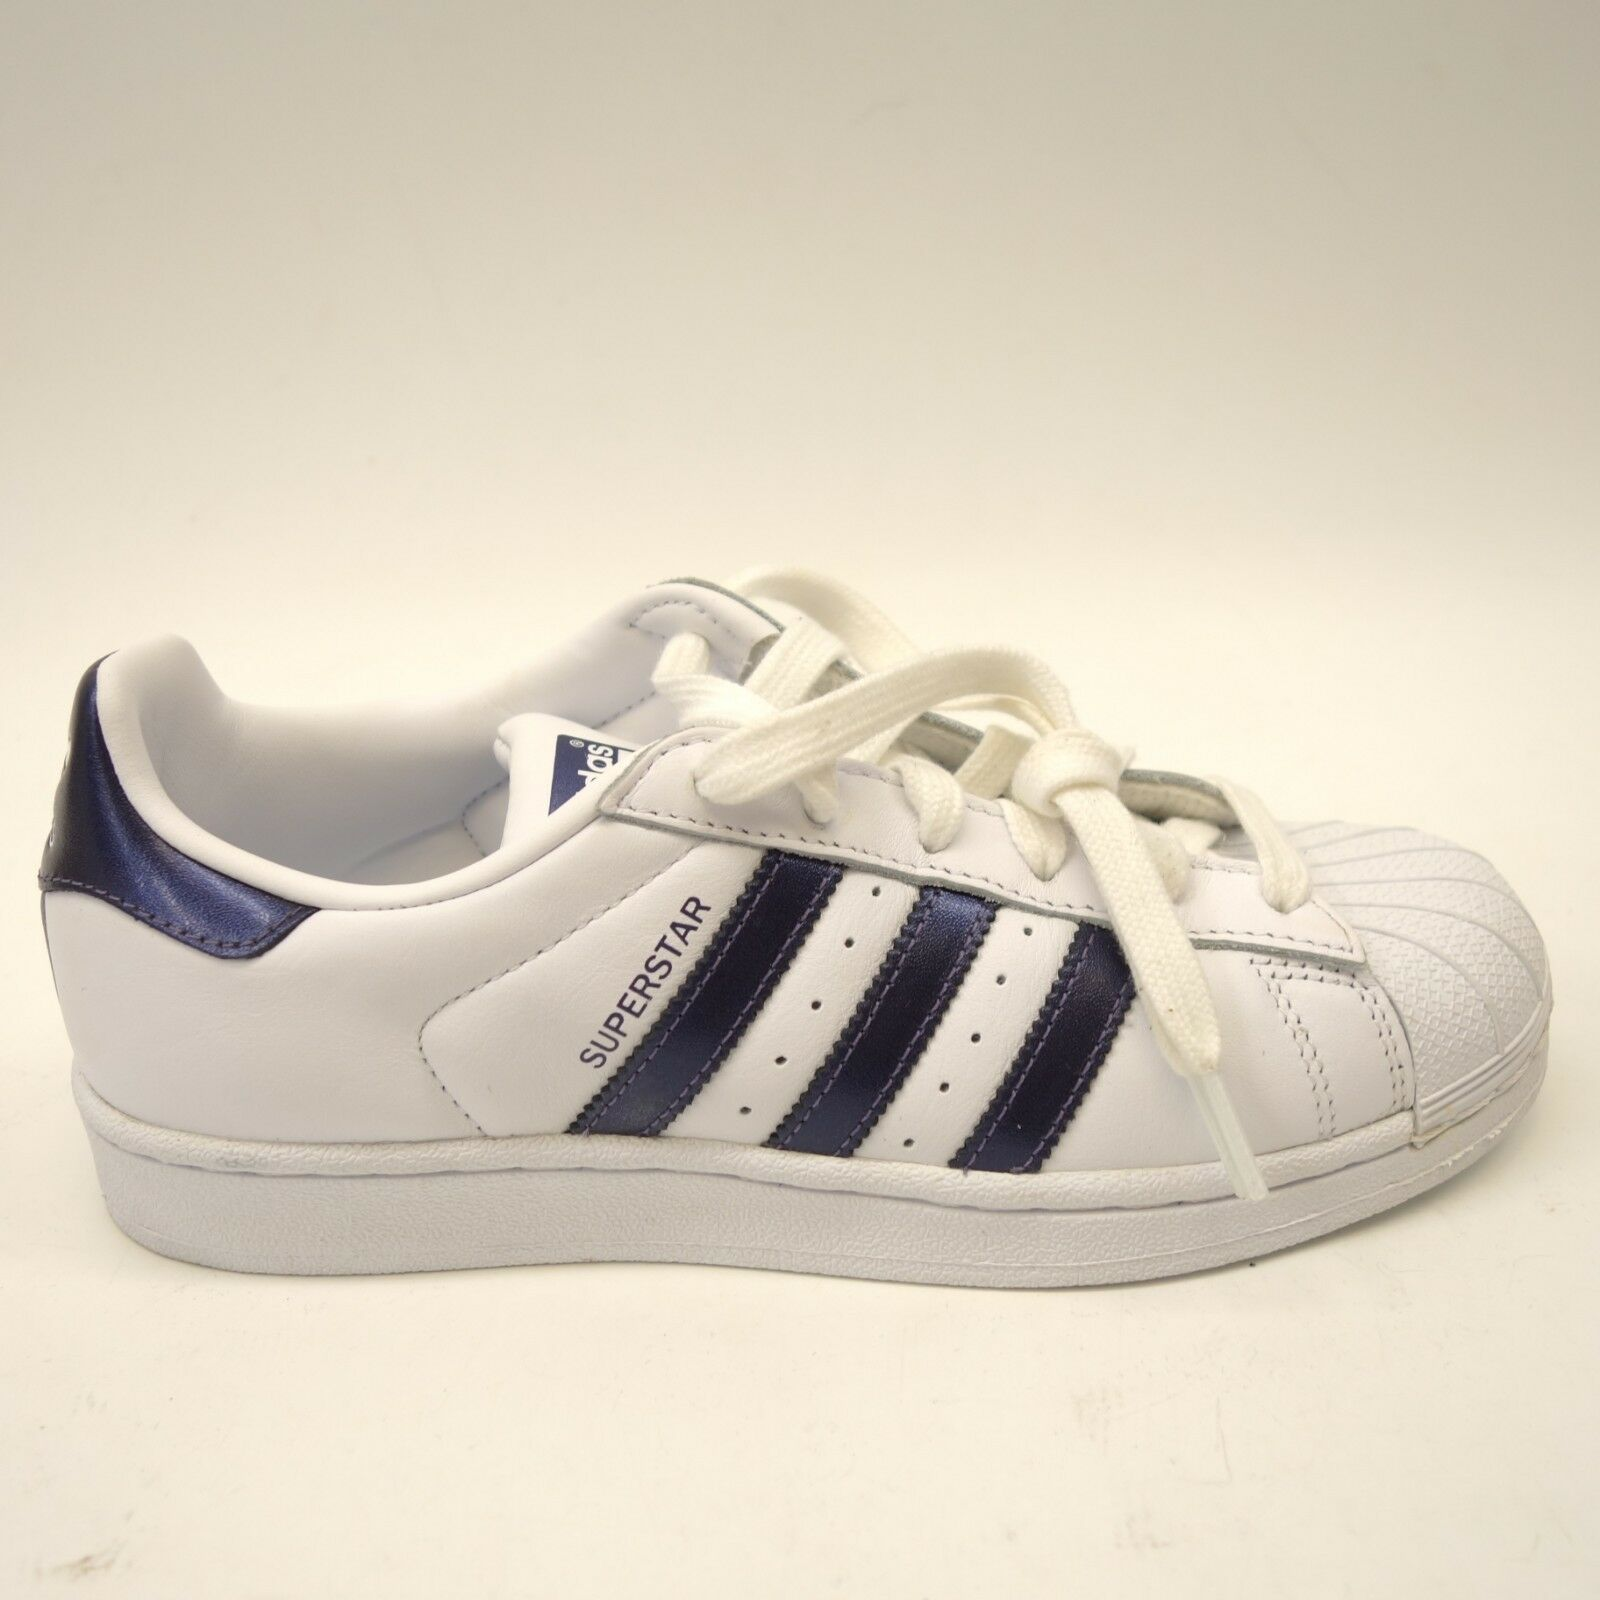 Adidas donna  Originals Superstar W CG5464 bianca viola Metallic scarpe Dimensione 6.5  colorways incredibili